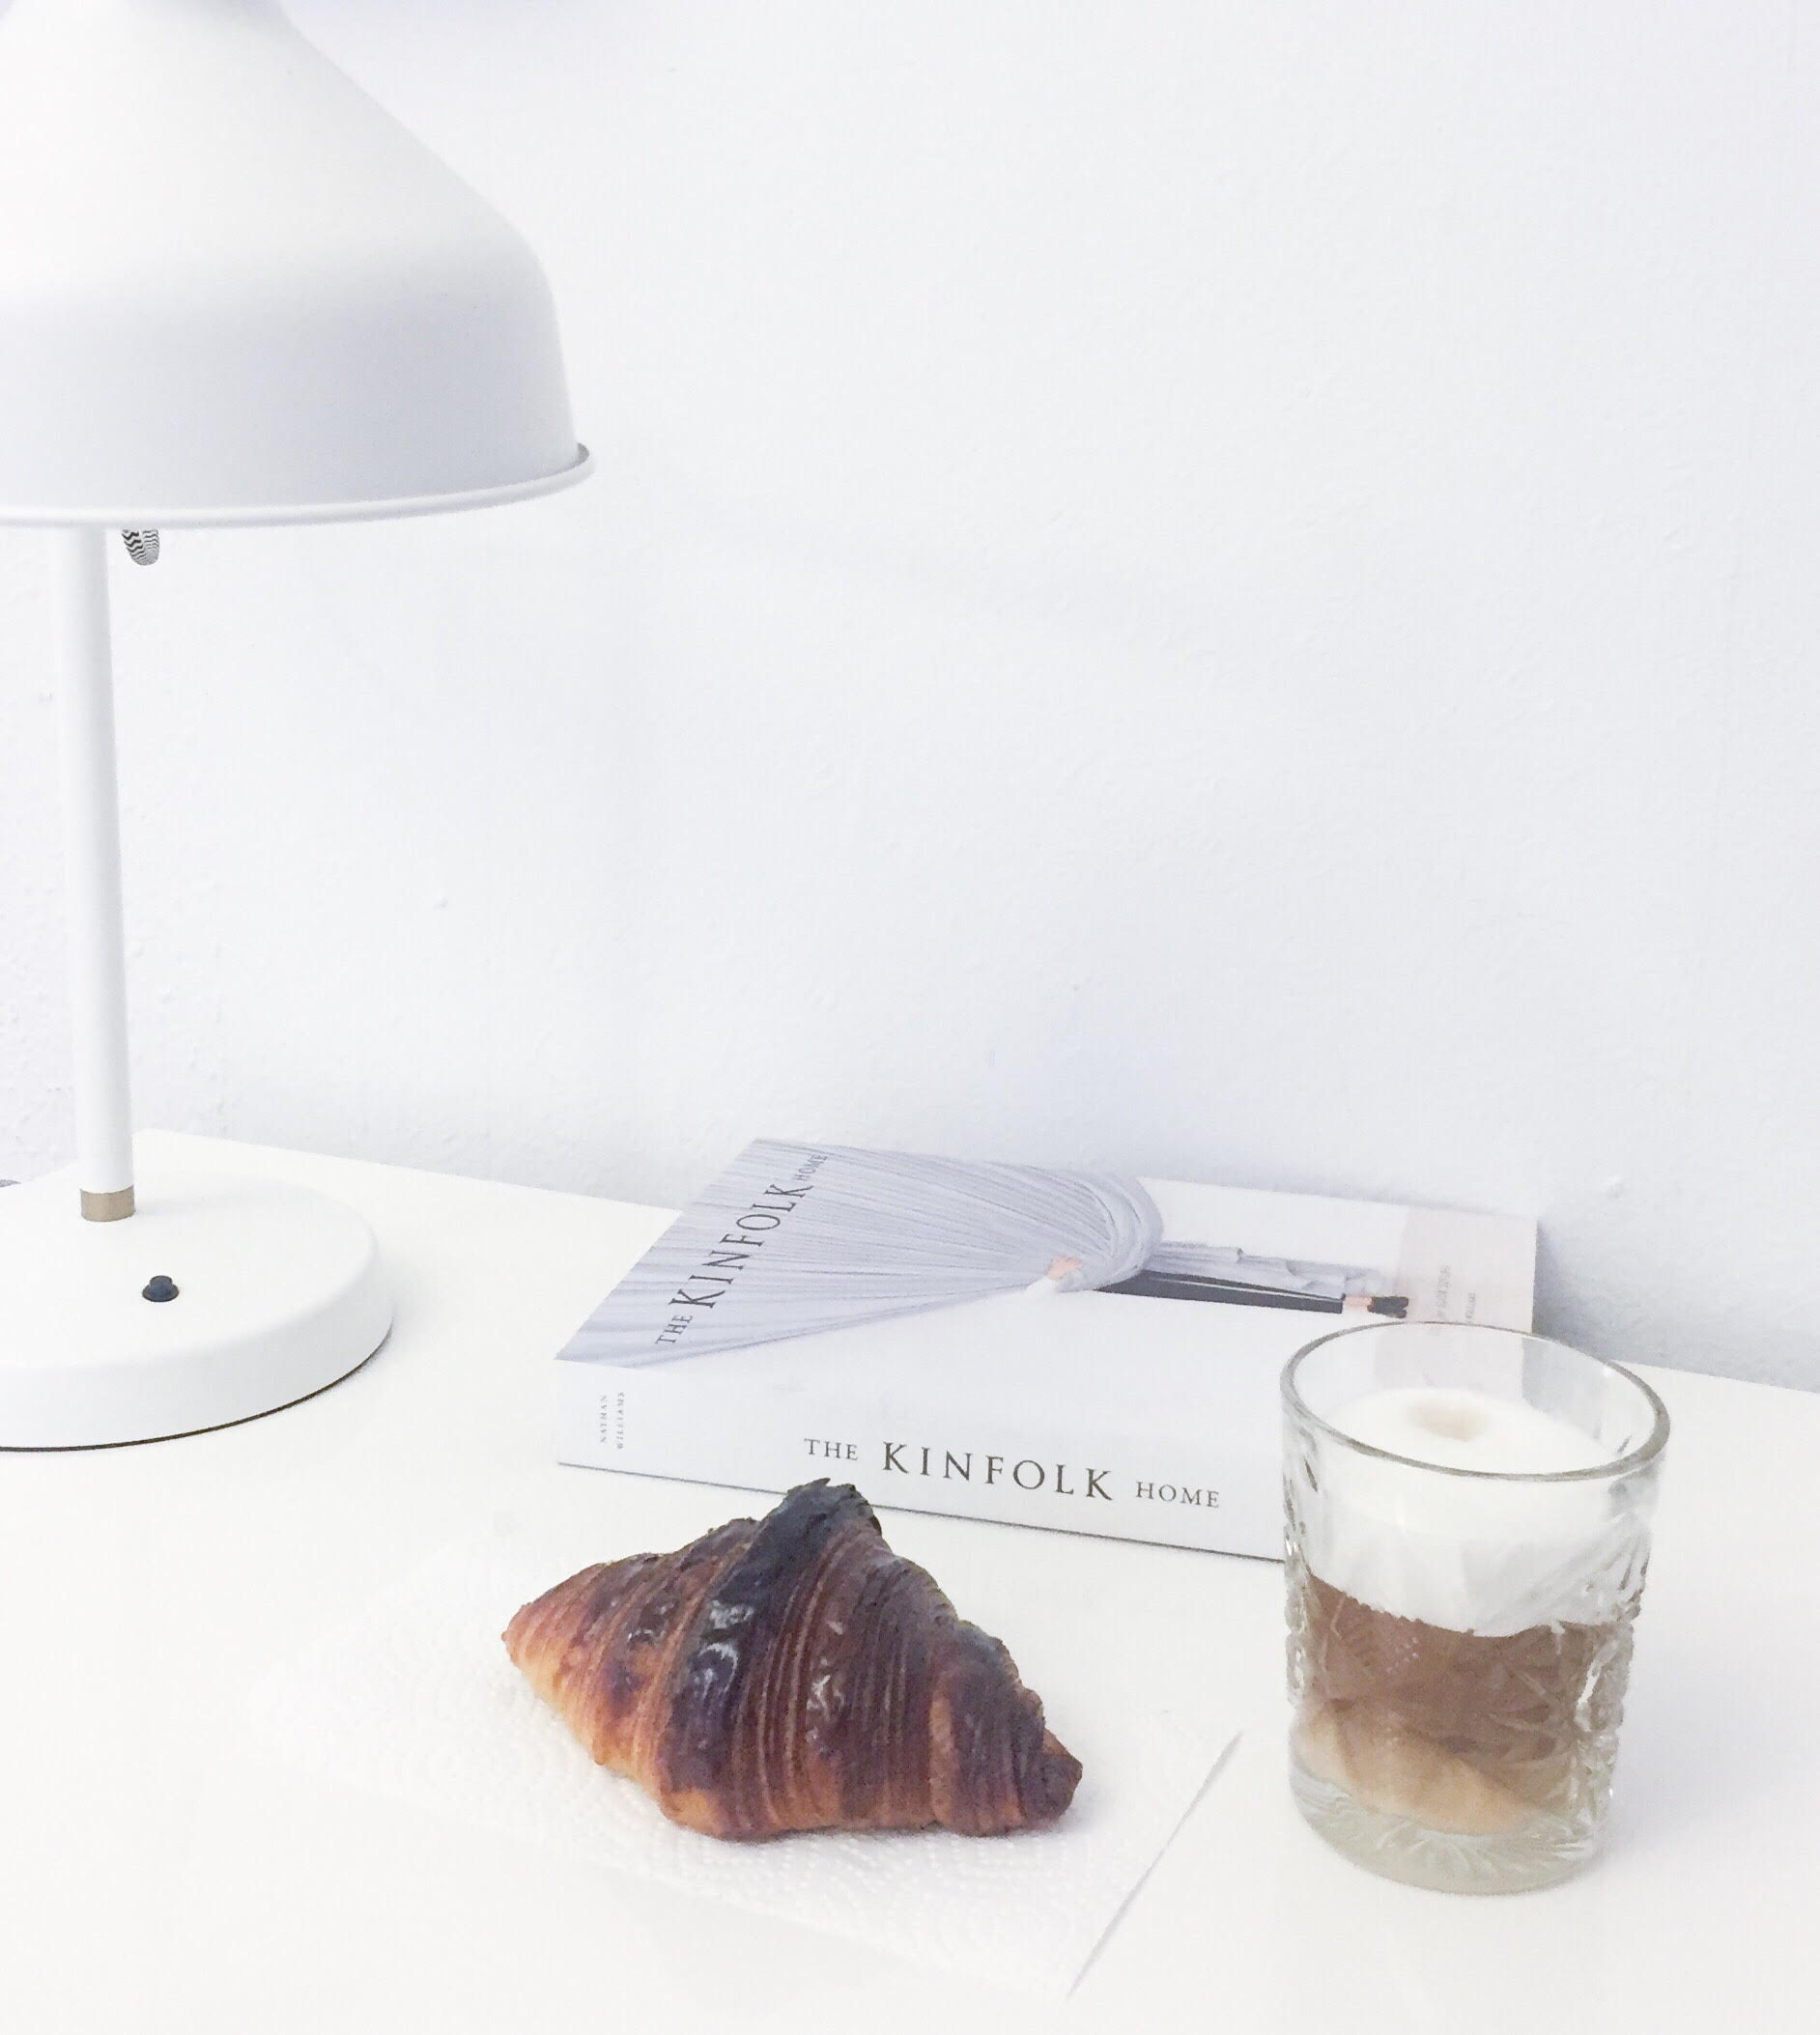 blogger og Instagram privat influent kaffe og croissant